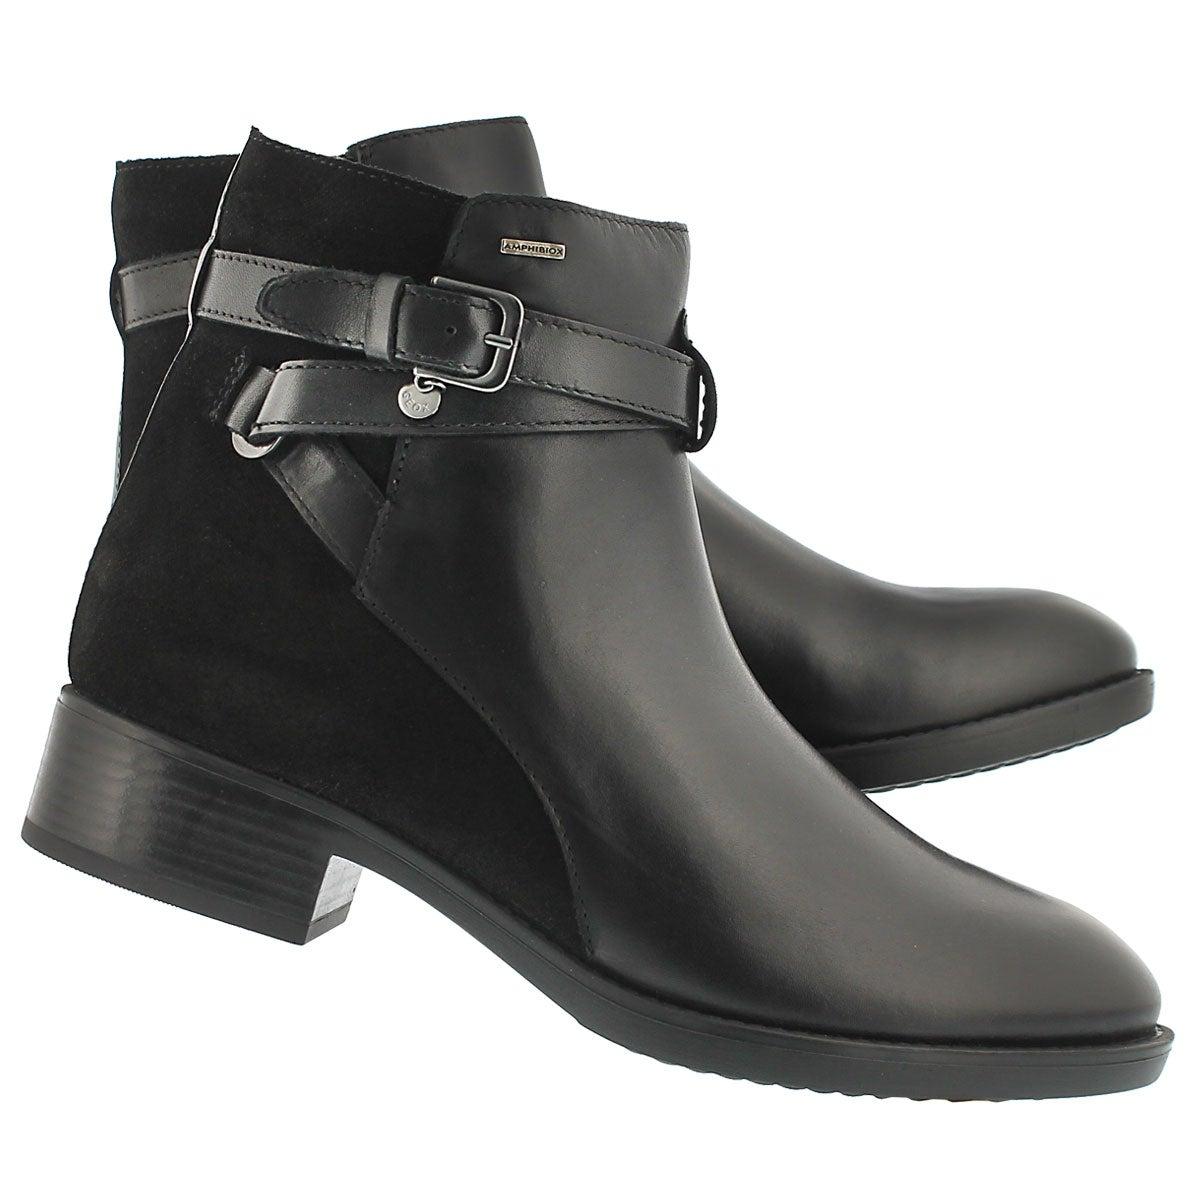 Lds Felicity ABX B blk ankle bootie